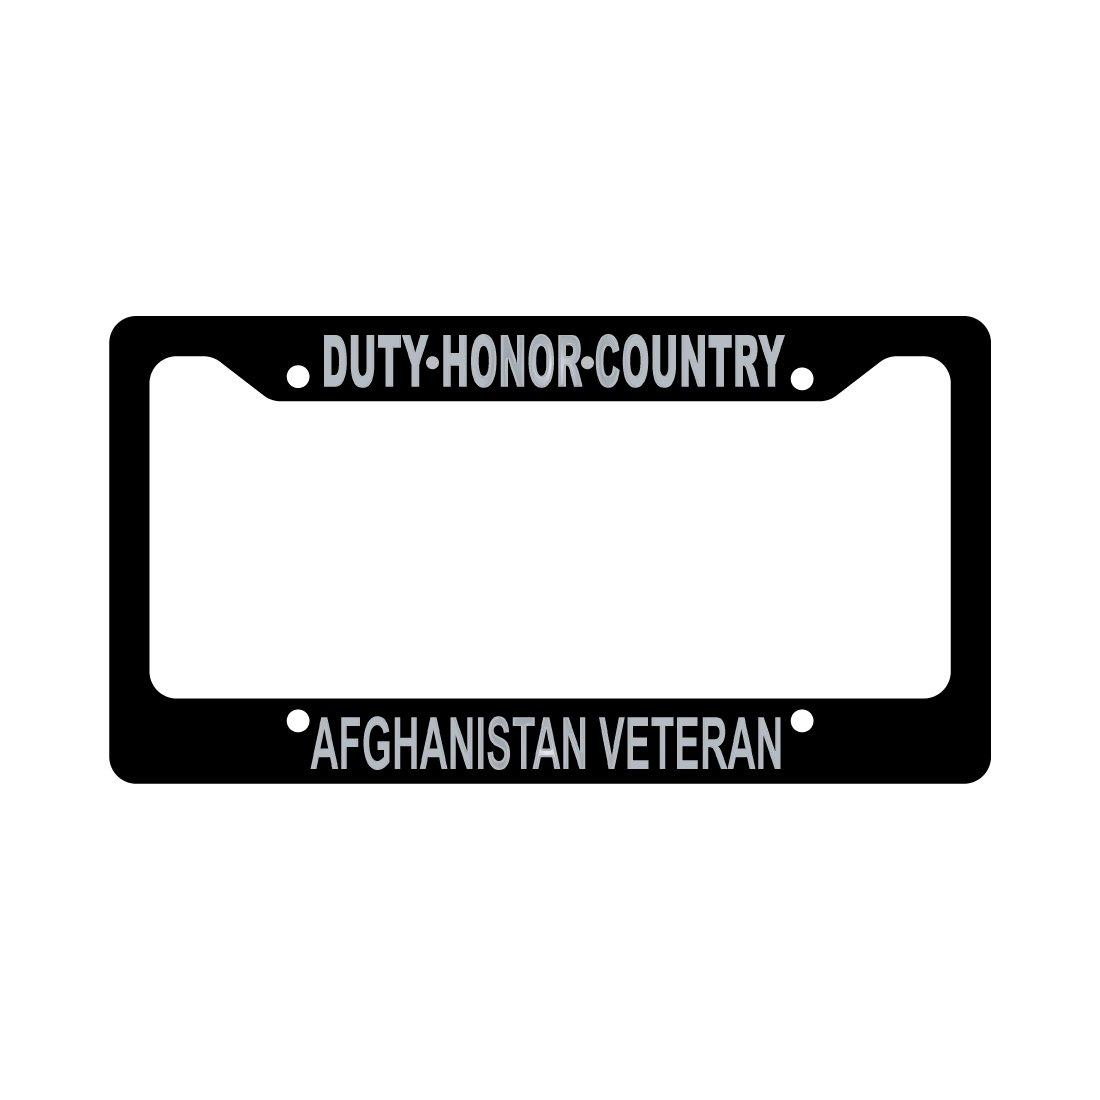 Afghanistan Veteran auto license plate frame